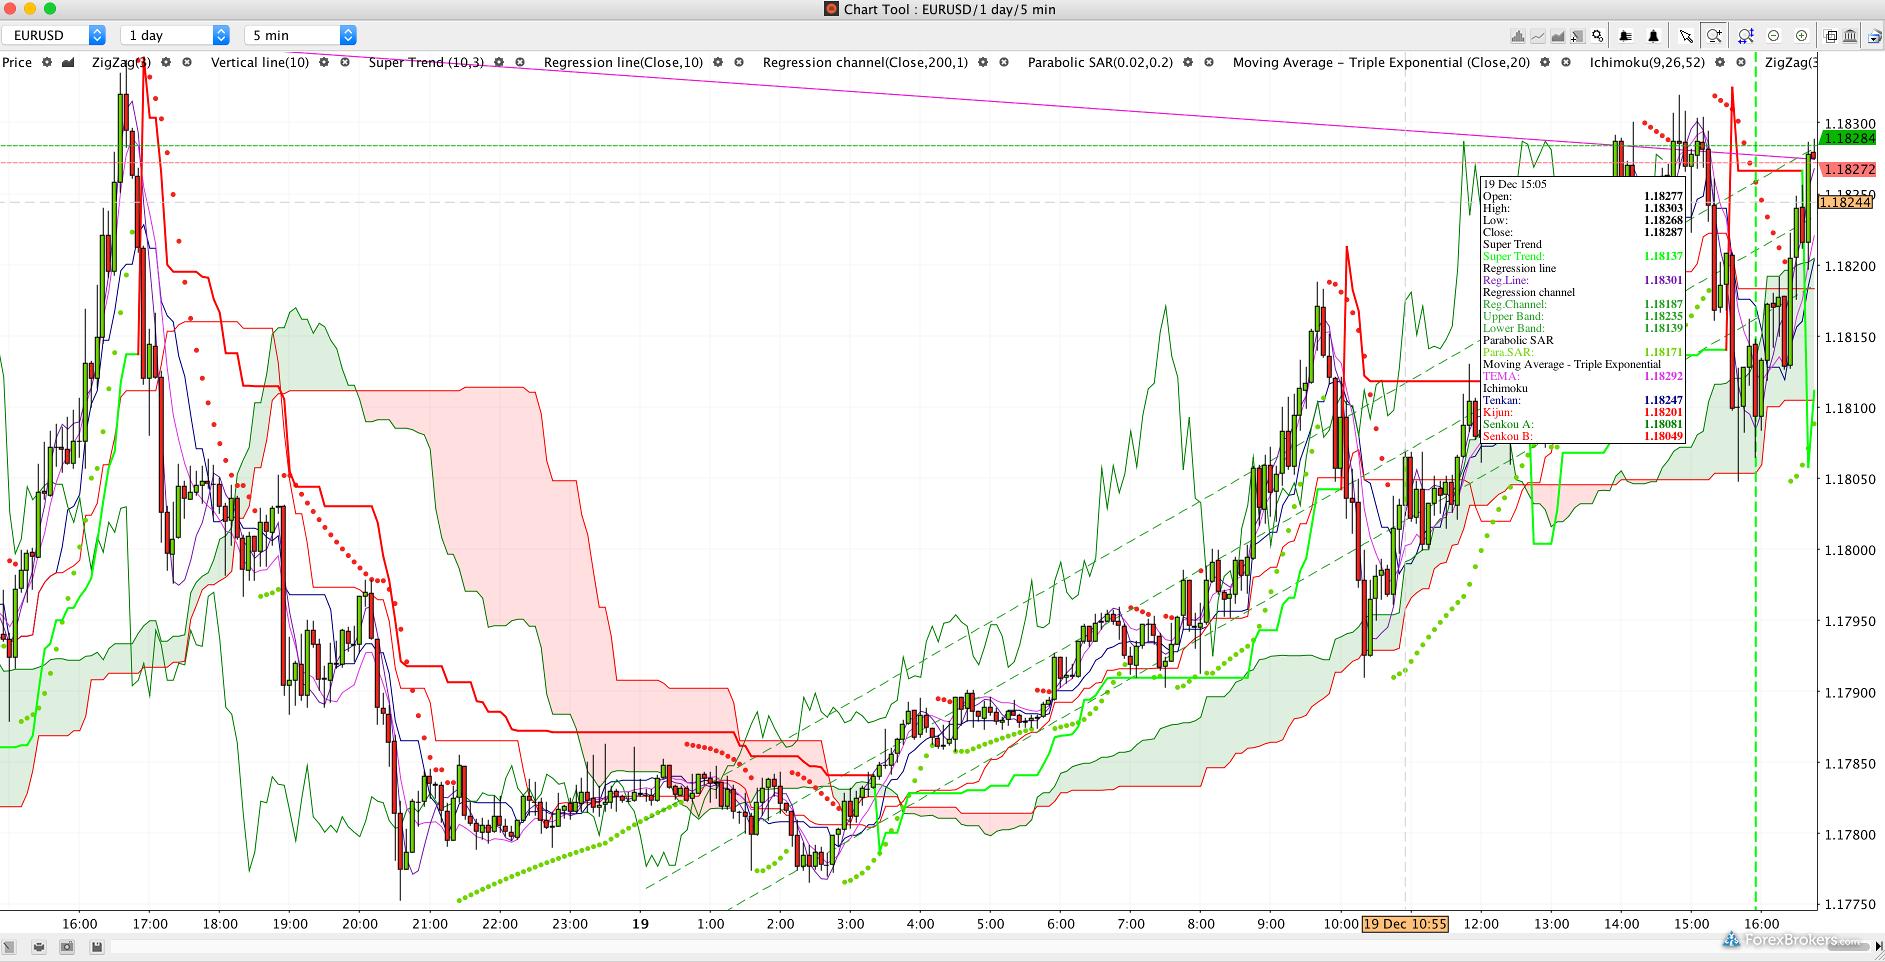 Swissquote bank Advanced Trader Desktop platform charting